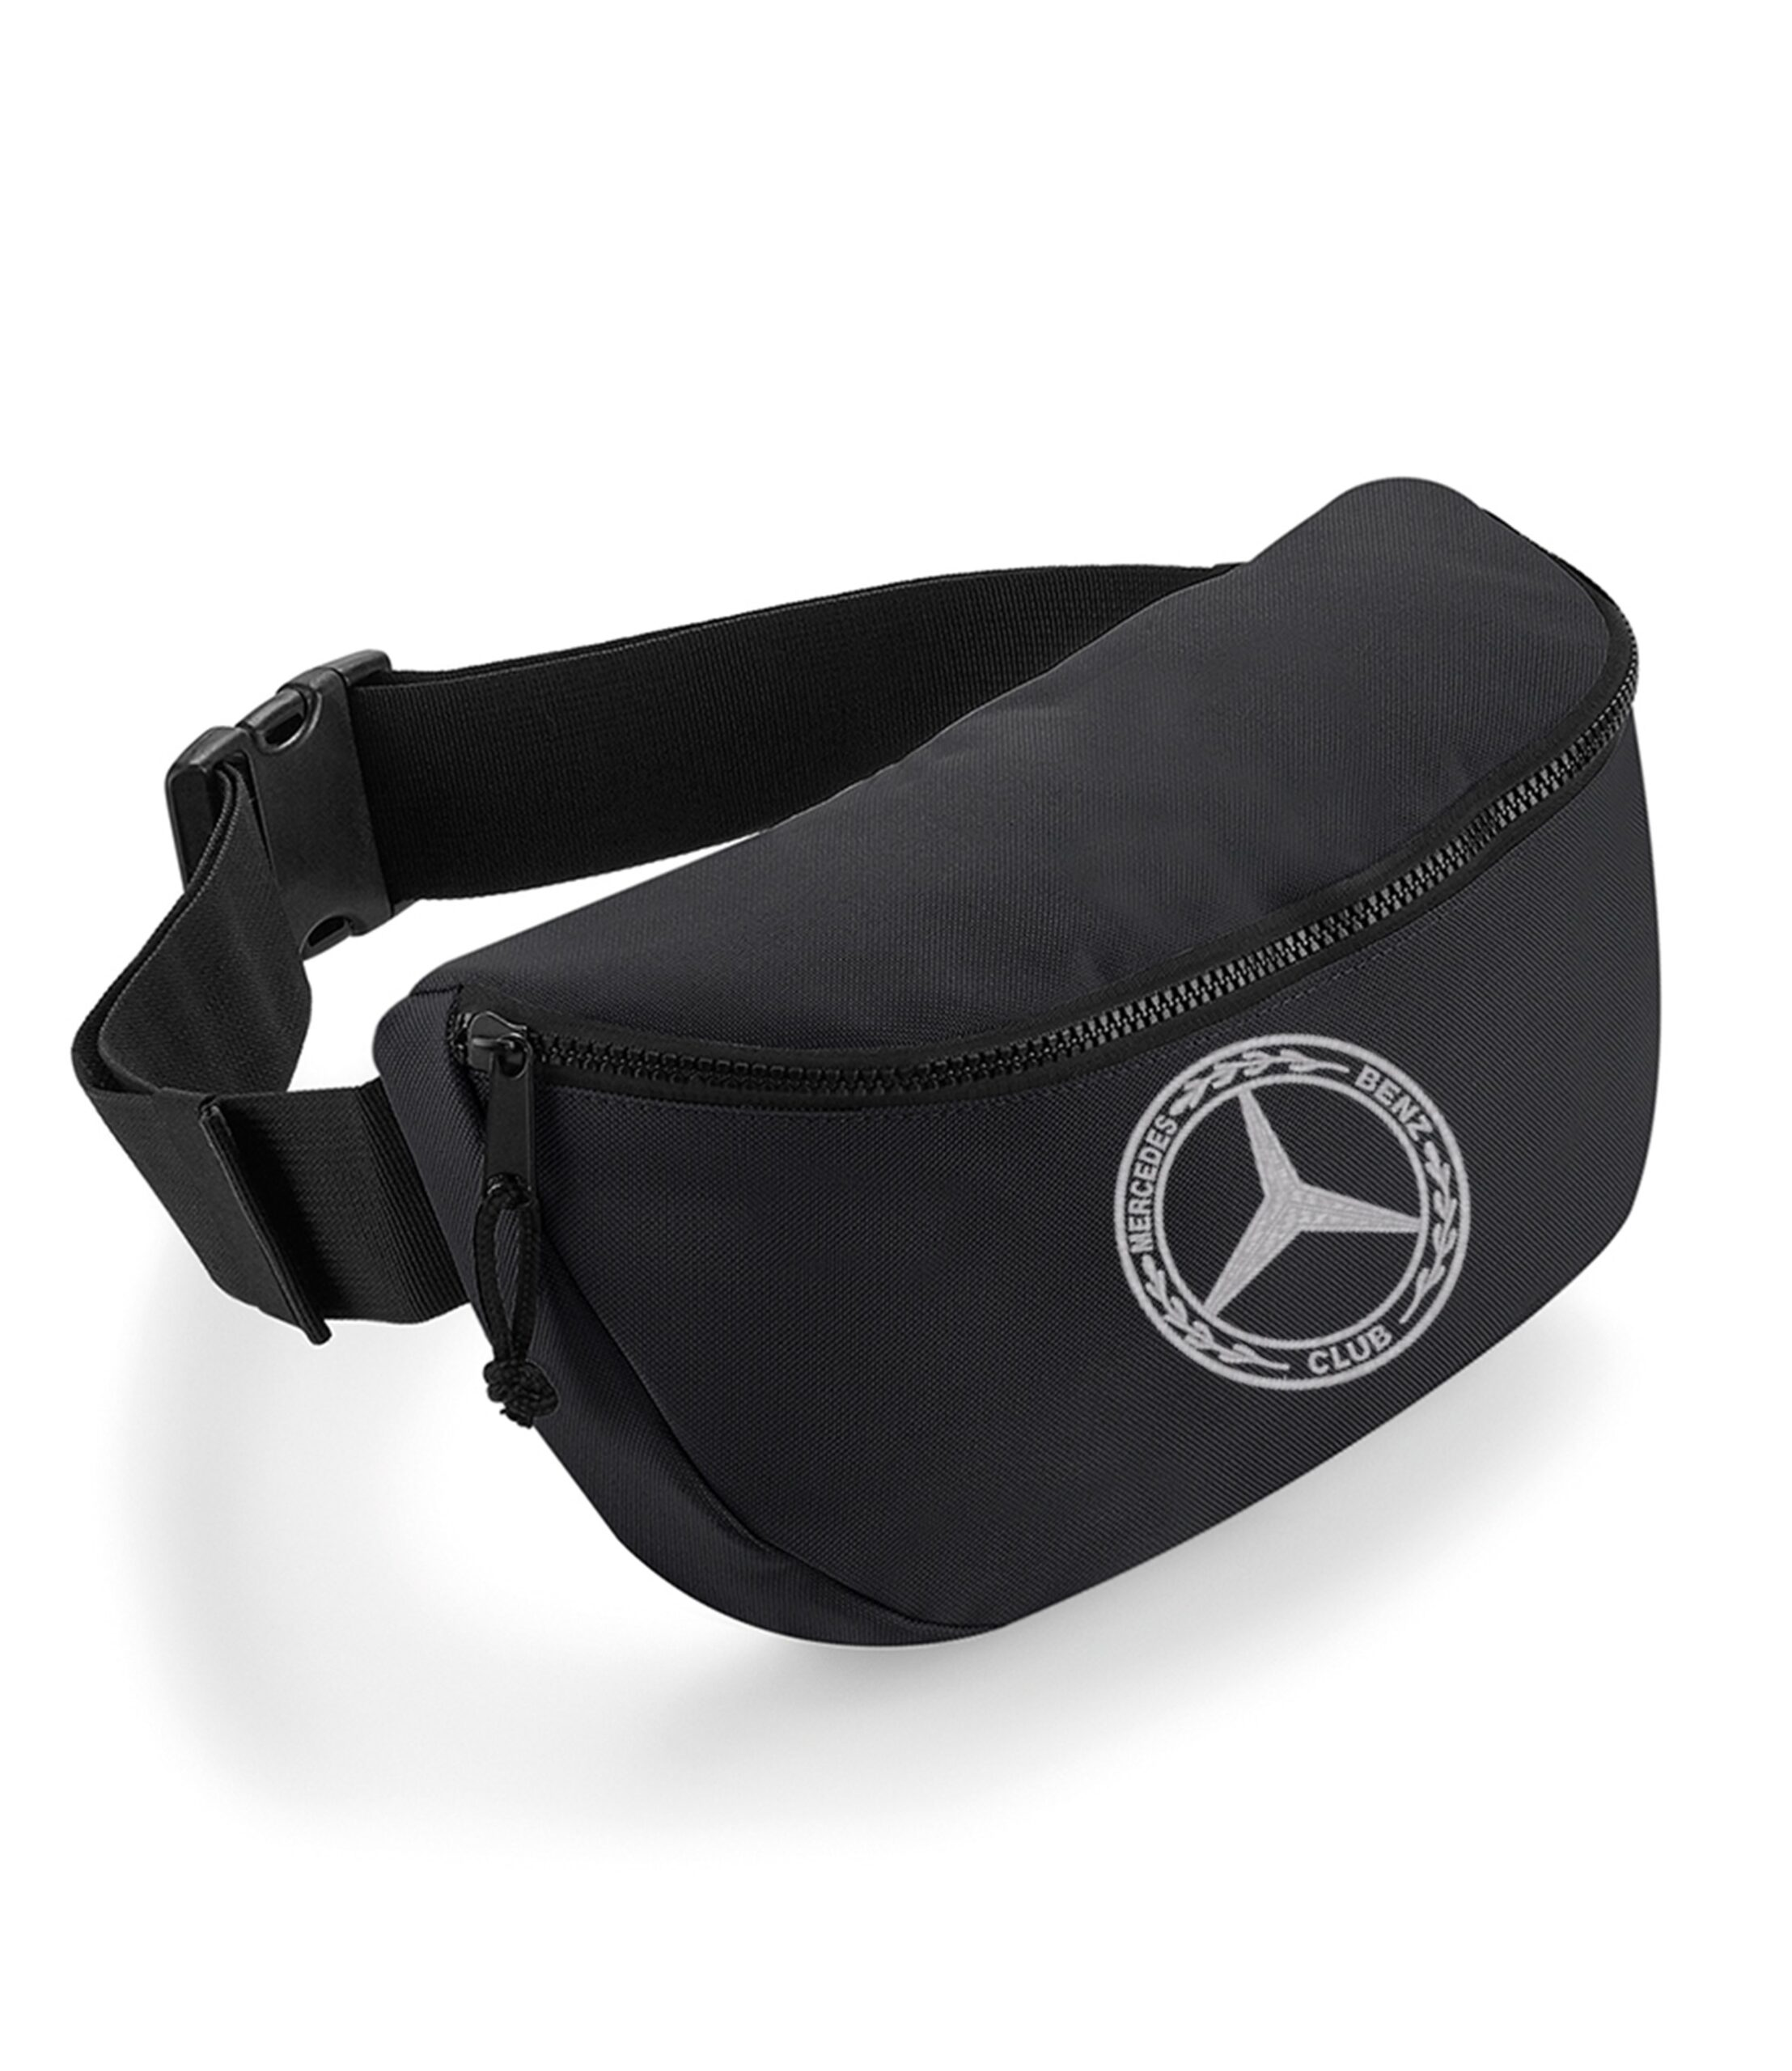 Mercedes-Benz Club Oversized Belt Bag